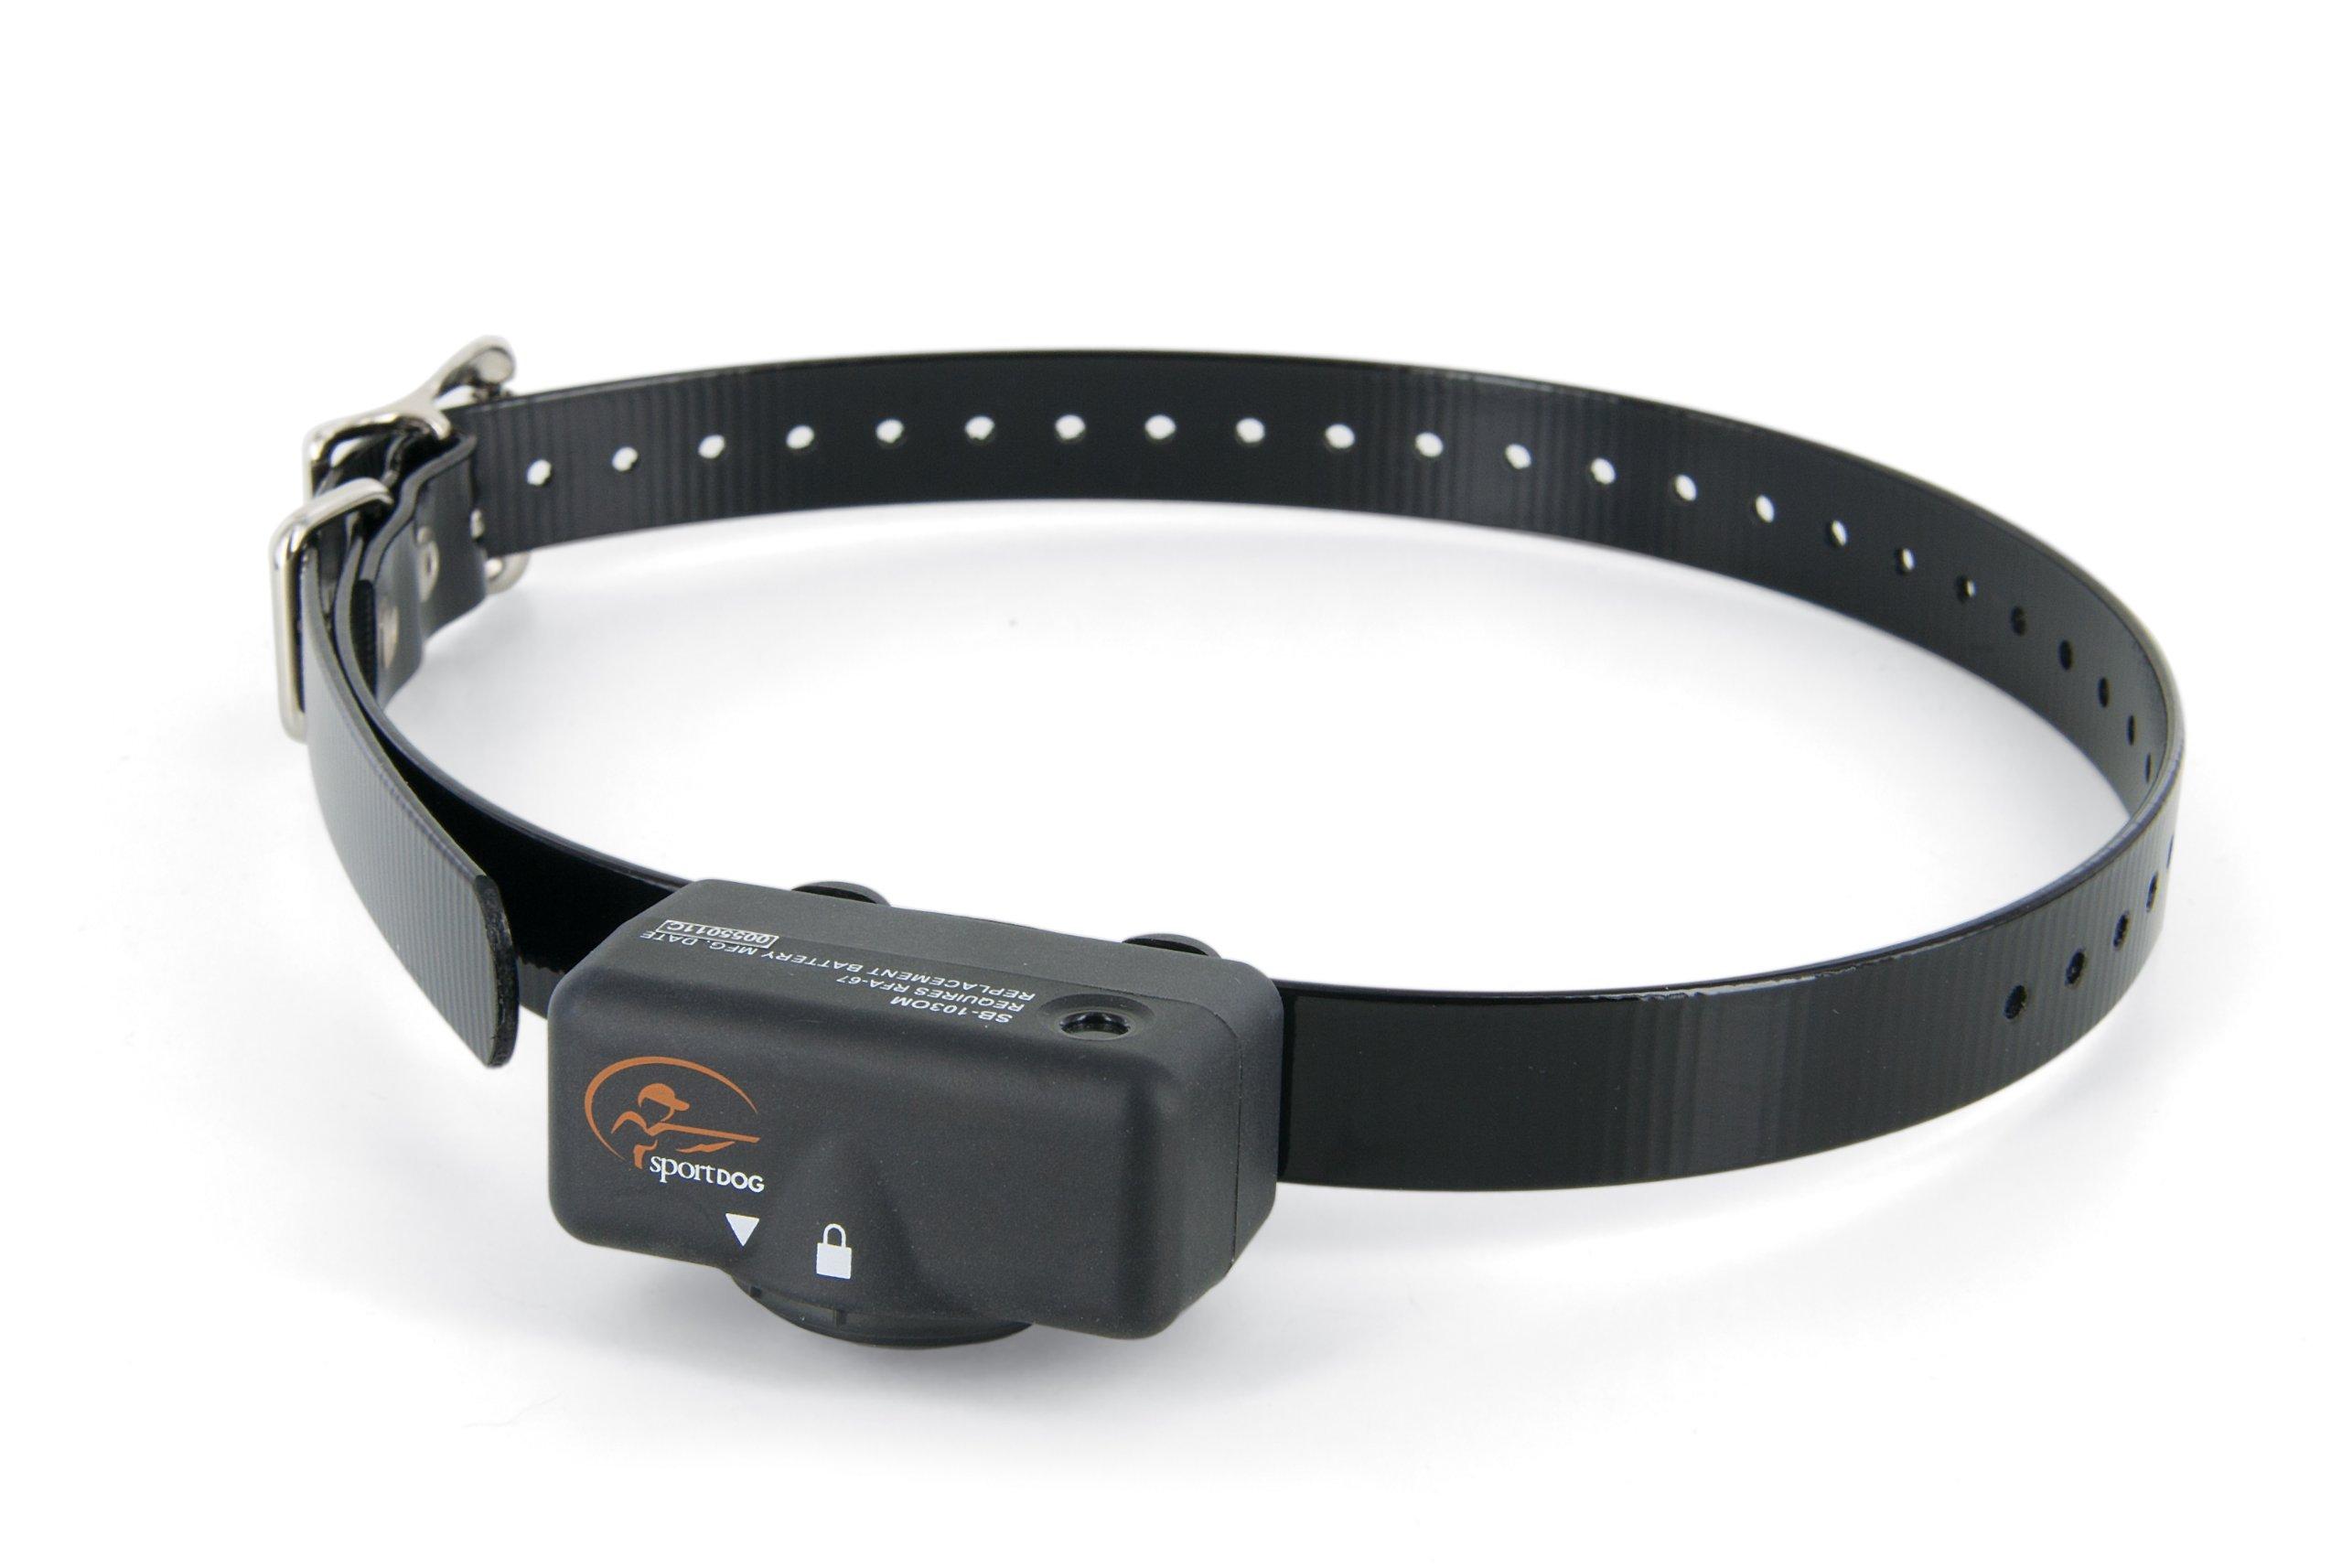 SportDOG Brand NoBark 6 - Waterproof Bark Control Collar with 6 Levels of Shock - No Programming Required by SportDOG Brand